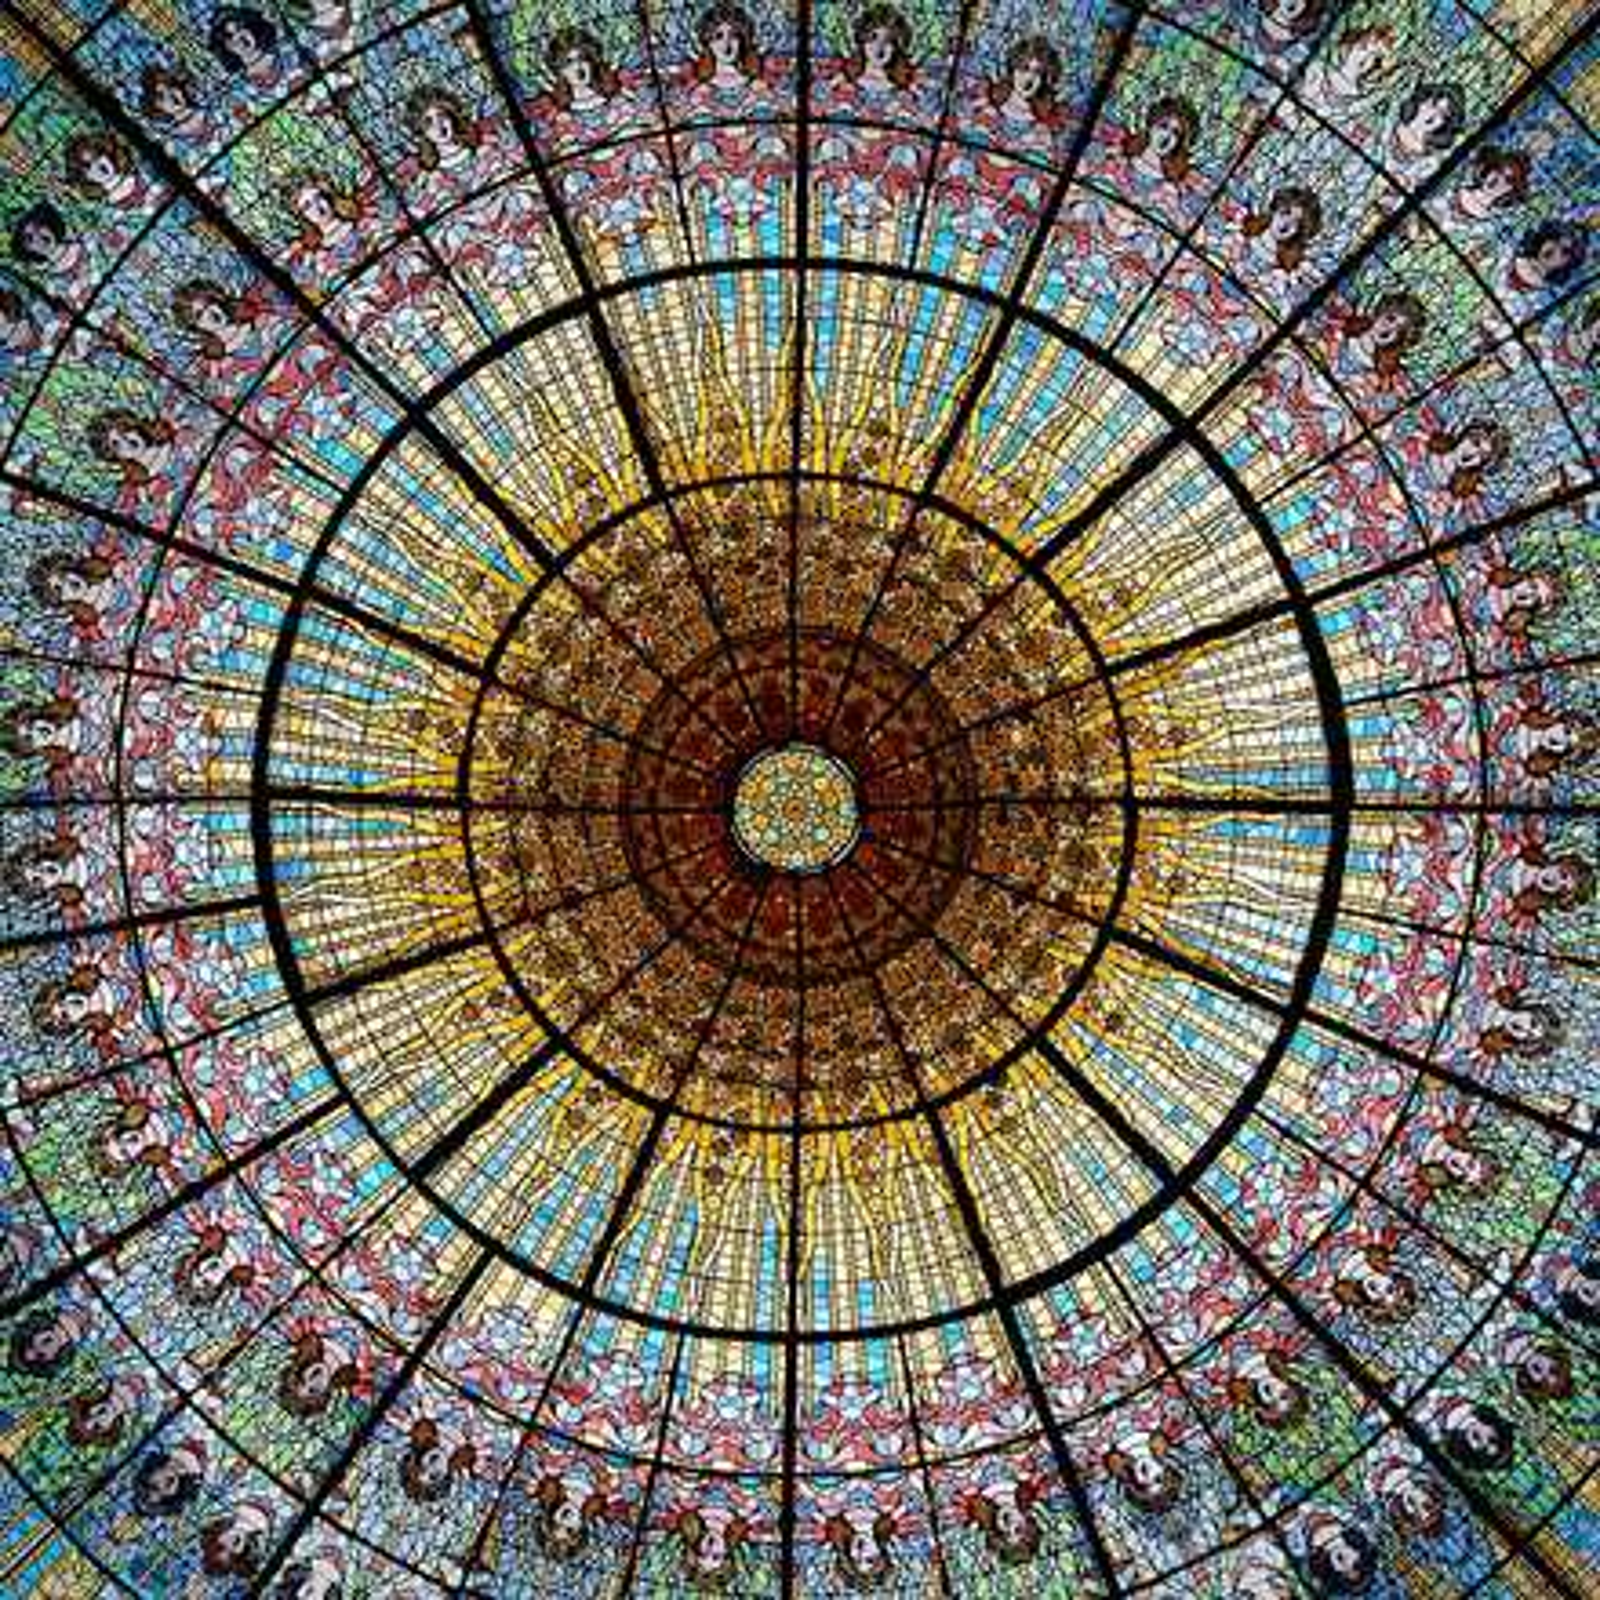 Palace of Catalan Music, Barcelona, Spain - Mikhail Porollo